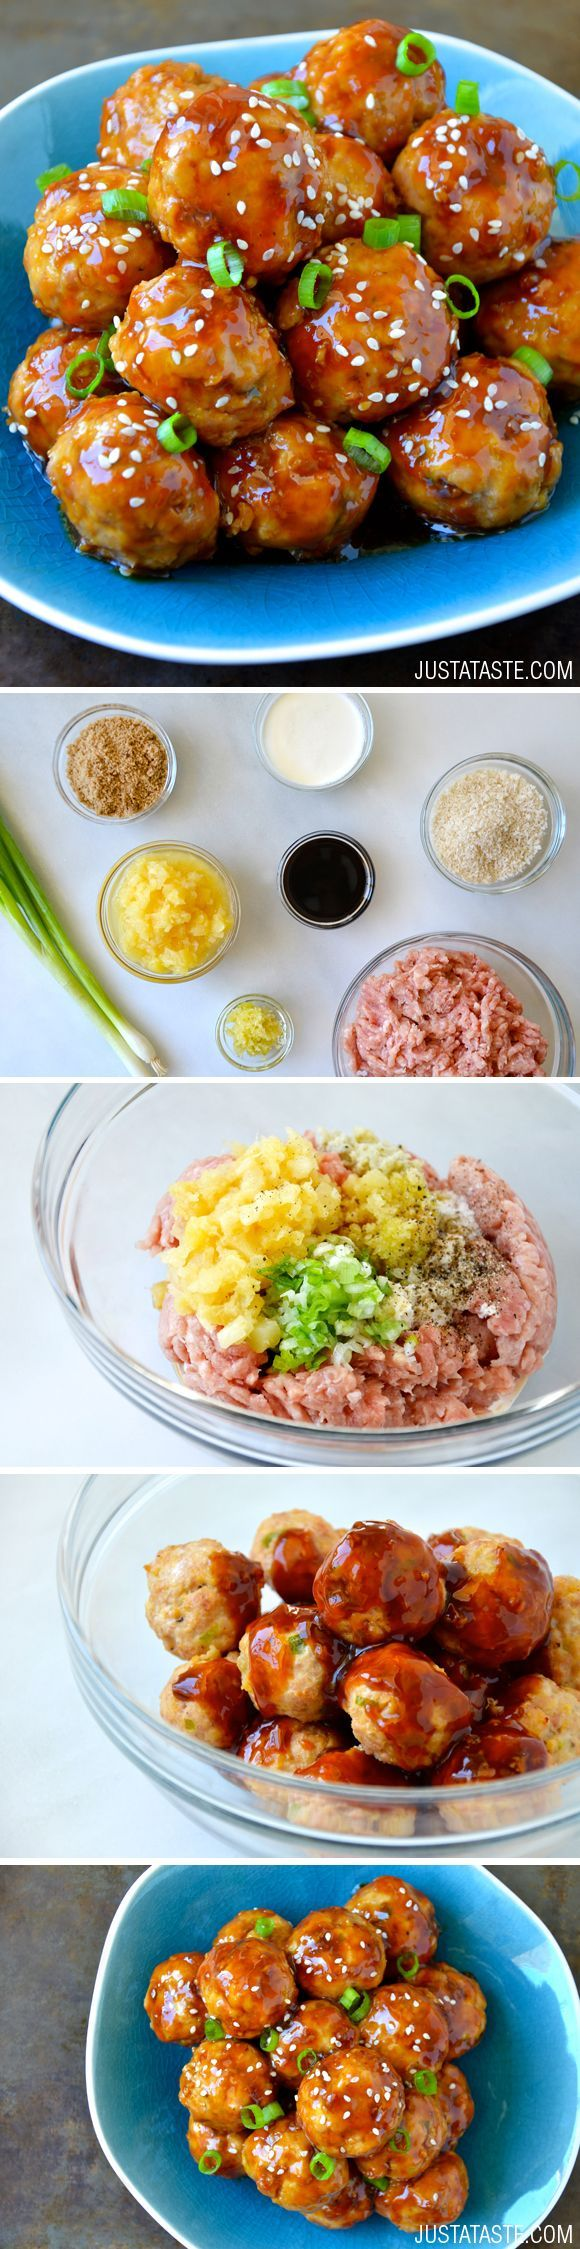 Baked Teriyaki Chicken Meatballs Recipe. #pioneersettler